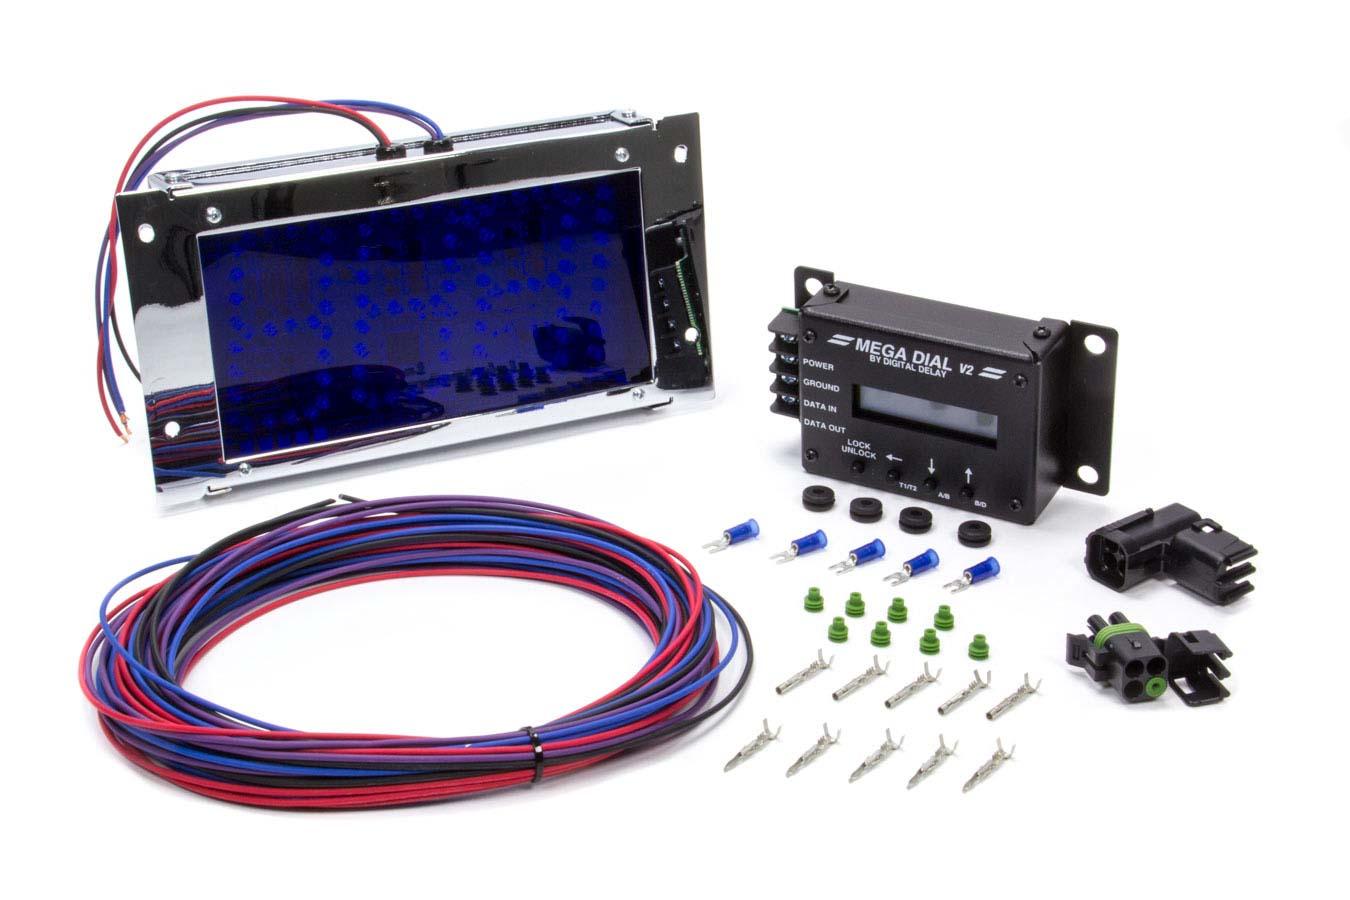 Racing Buy Drag Parts Biondo Delay Box Wiring Diagram Sentinel Green Led Digital Mega Dial In Board Kit P N Megadial